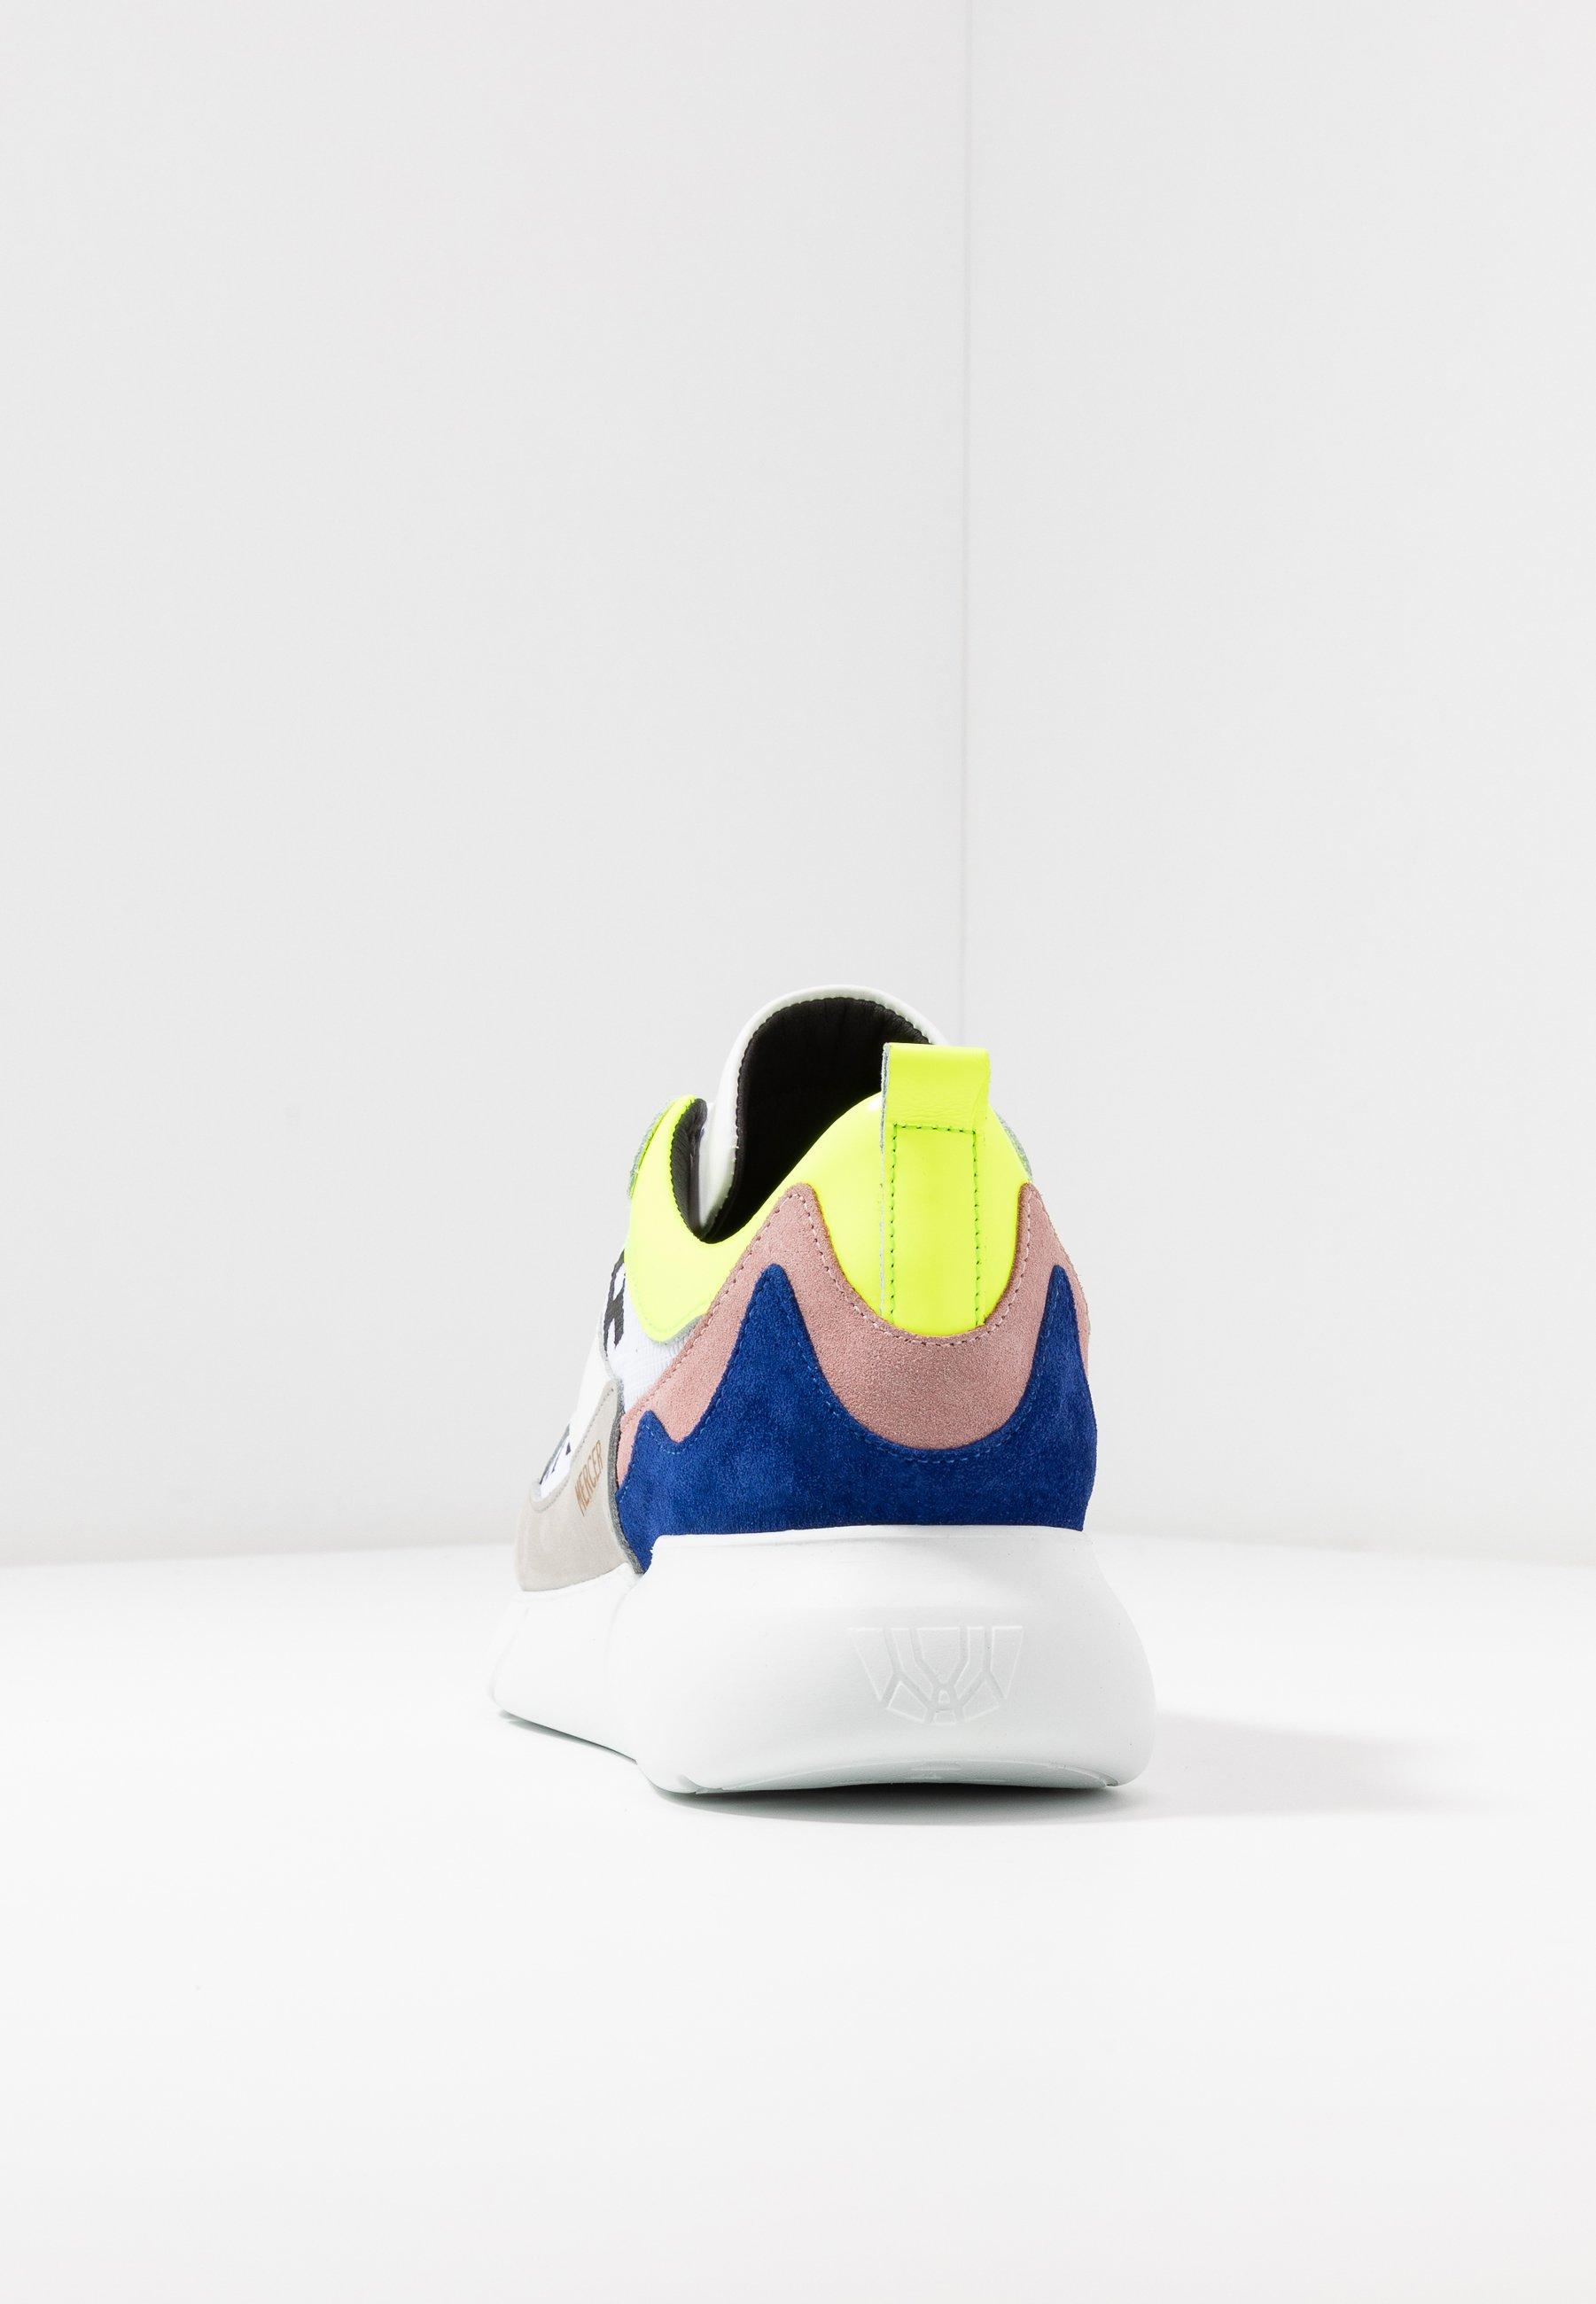 Mercer Amsterdam Baskets Basses - Yellow/blue/white